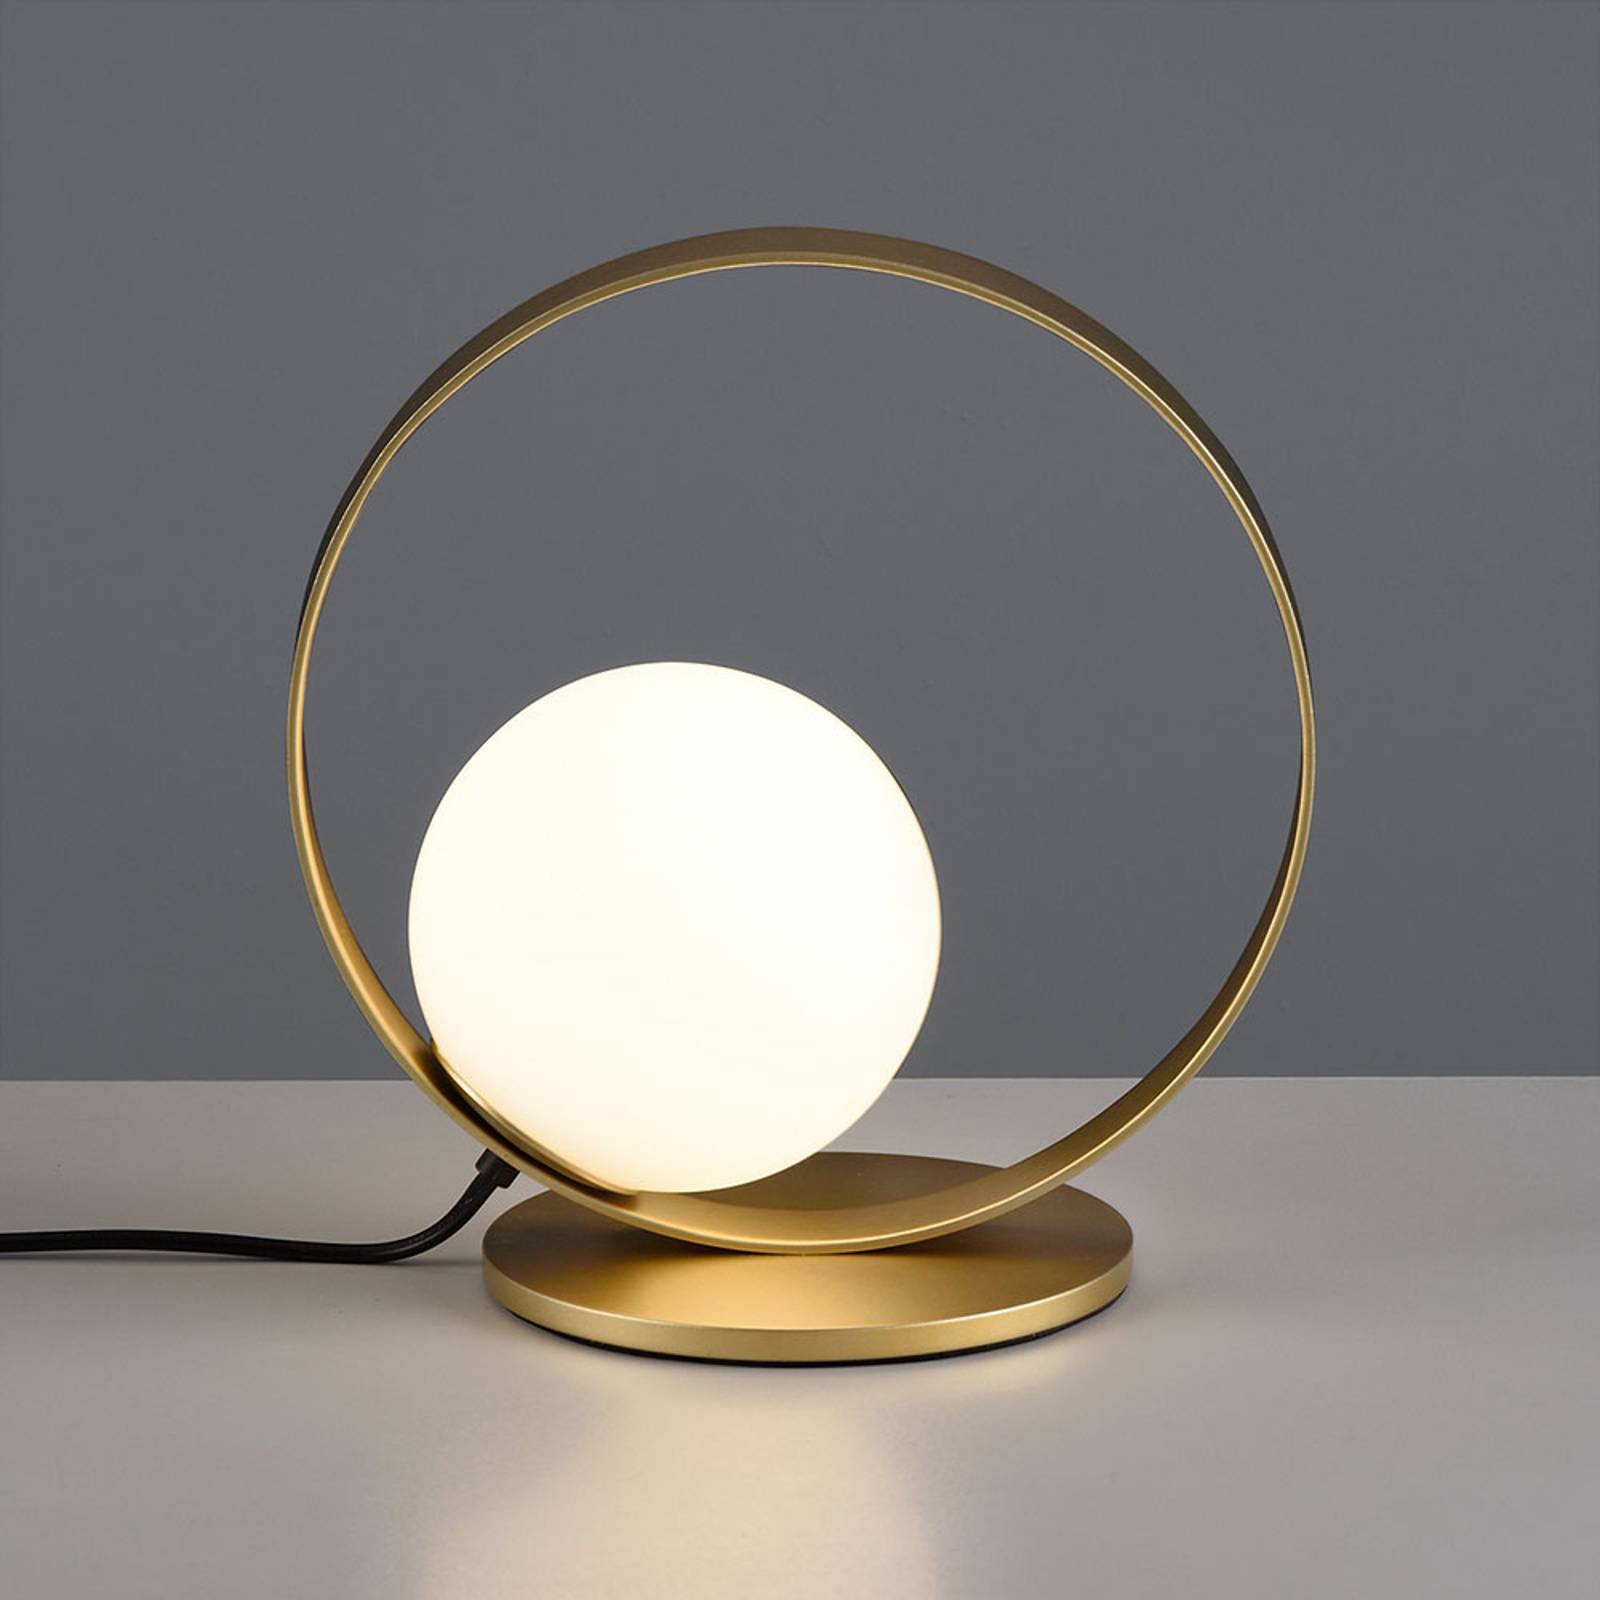 LED-Tischleuchte Halo, gold / opal